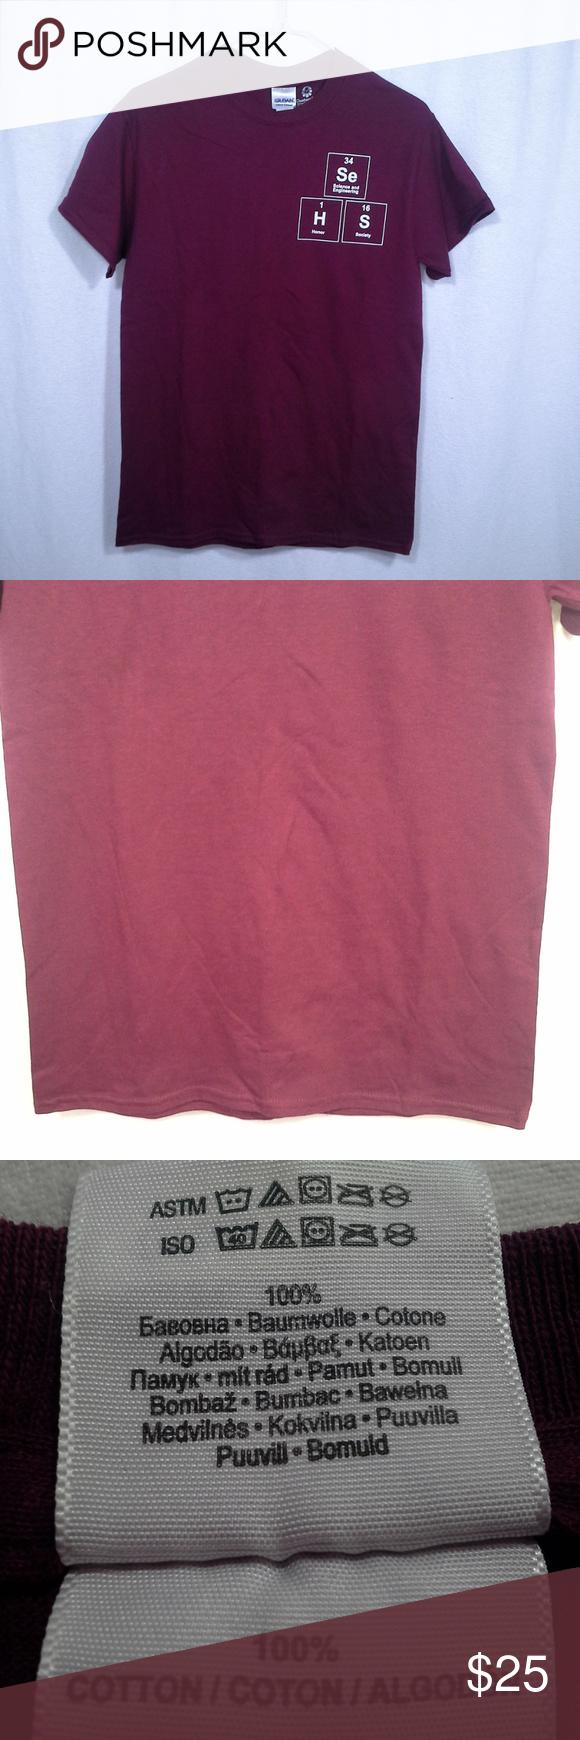 Gildan Custom Ink T Shirt Size Small Red Maroon Nwt My Posh Picks